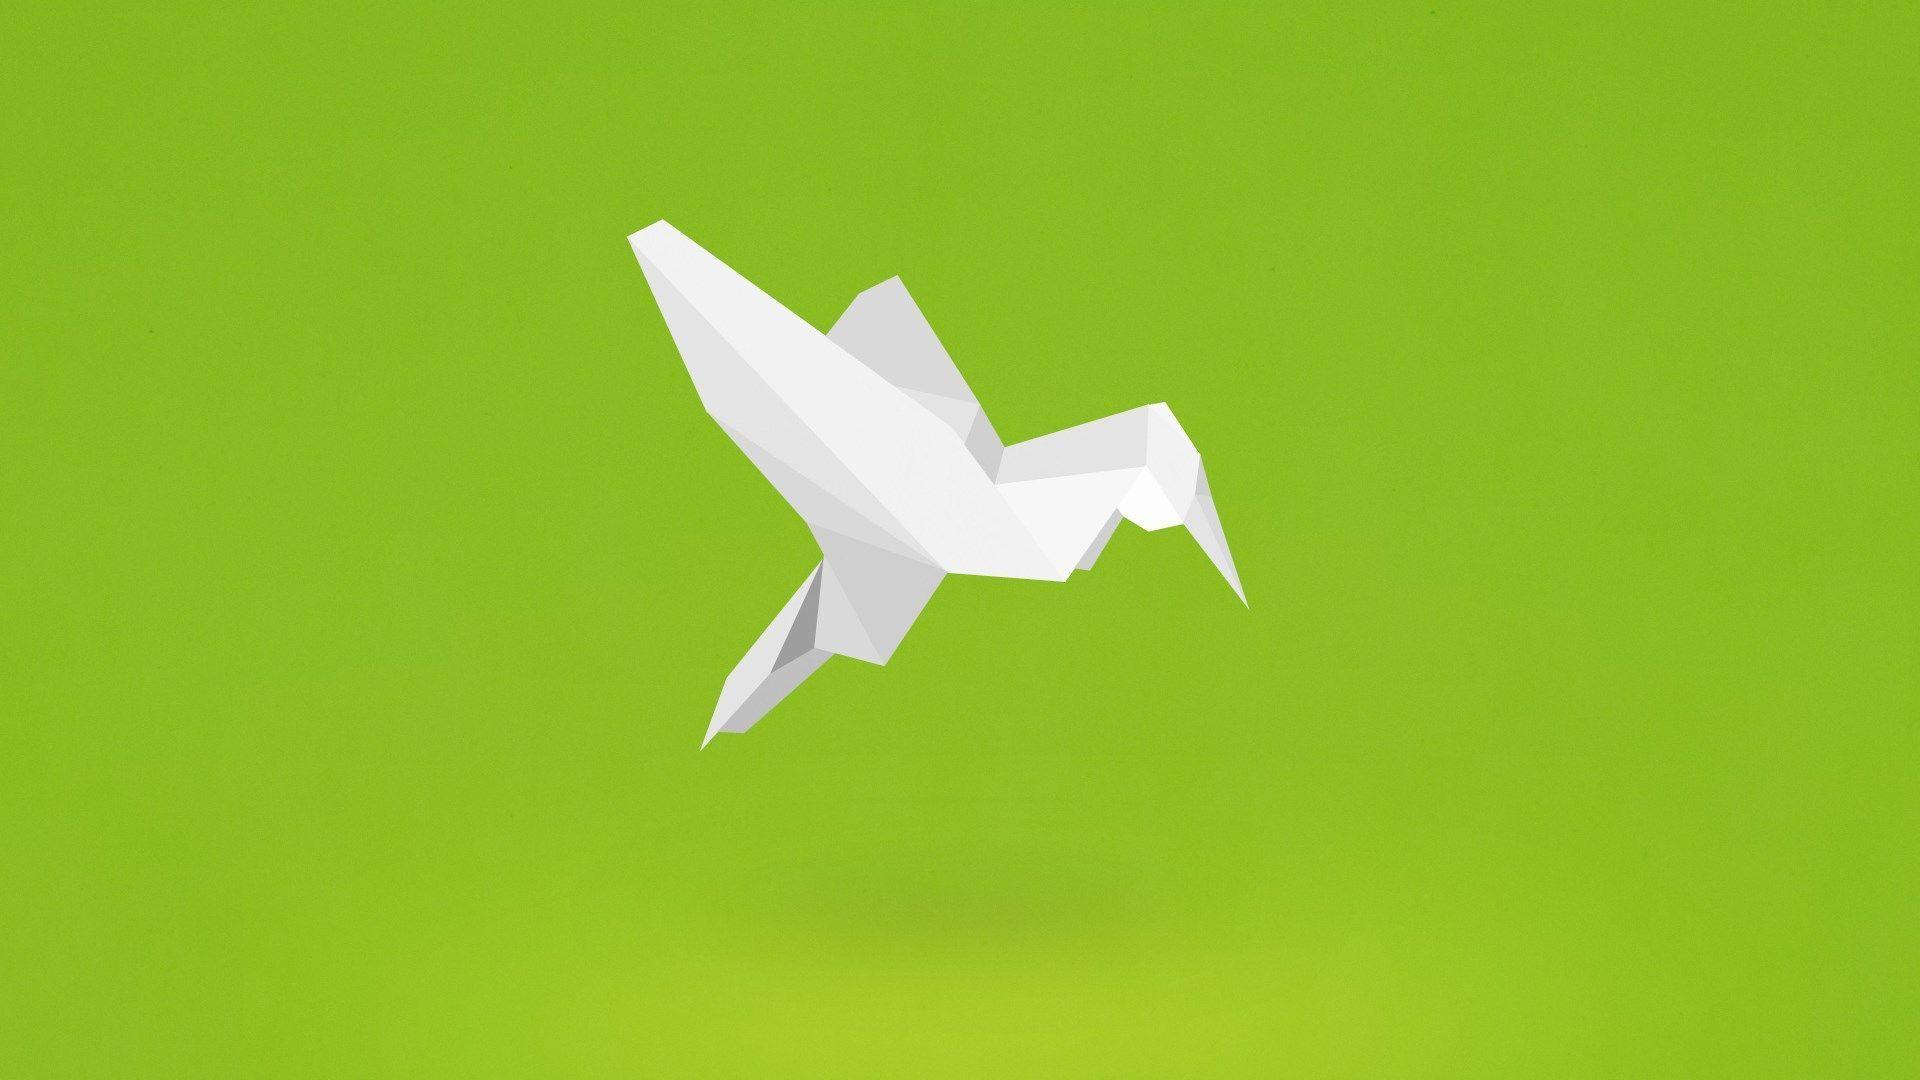 Origami wallpaper download